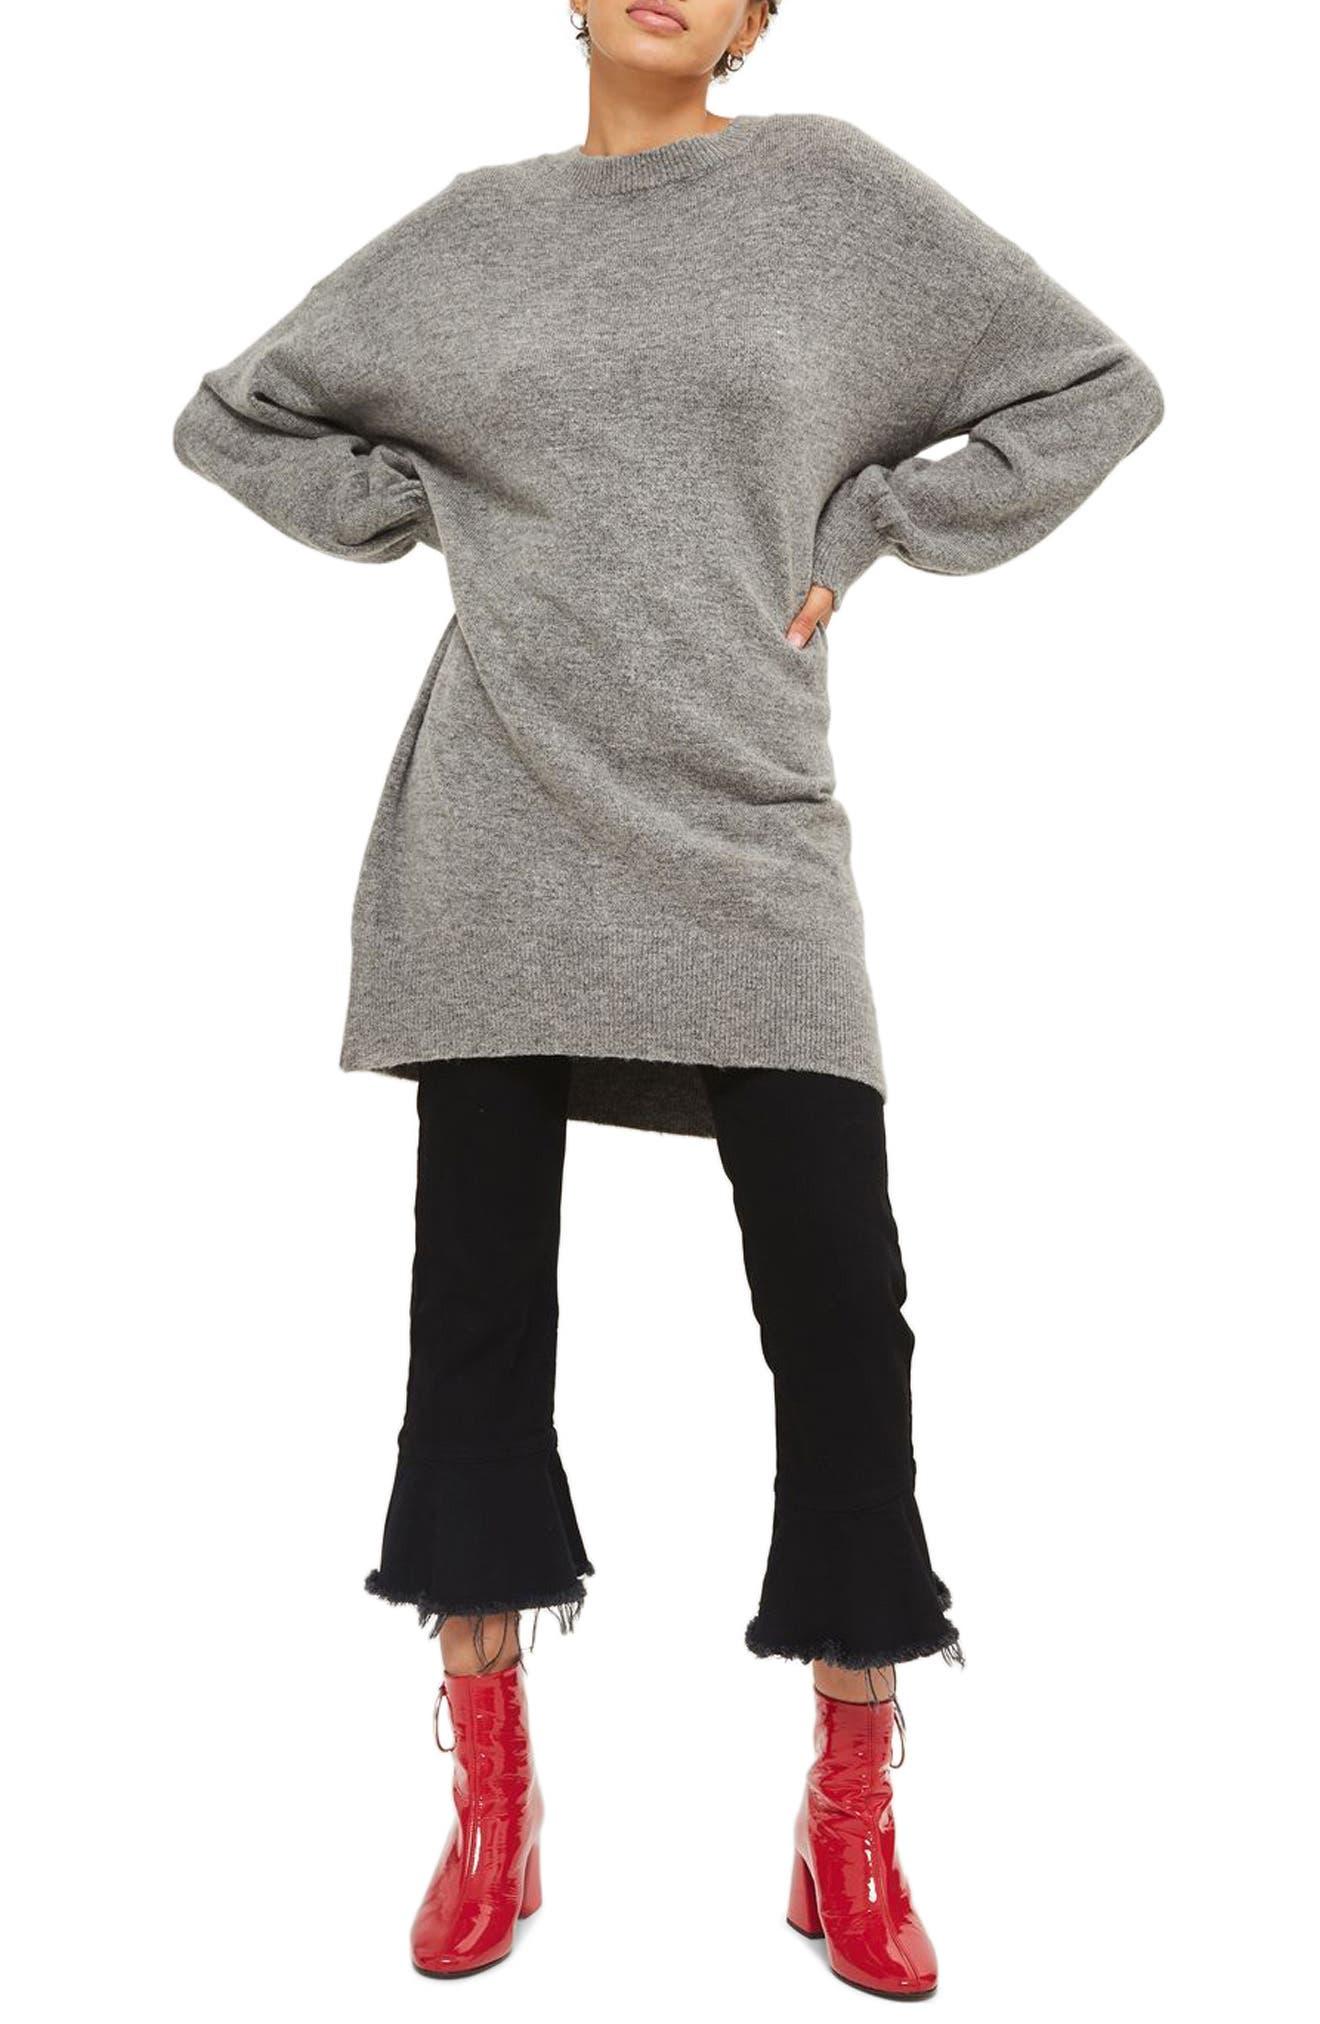 TOPSHOP, Sweater Dress, Main thumbnail 1, color, 021